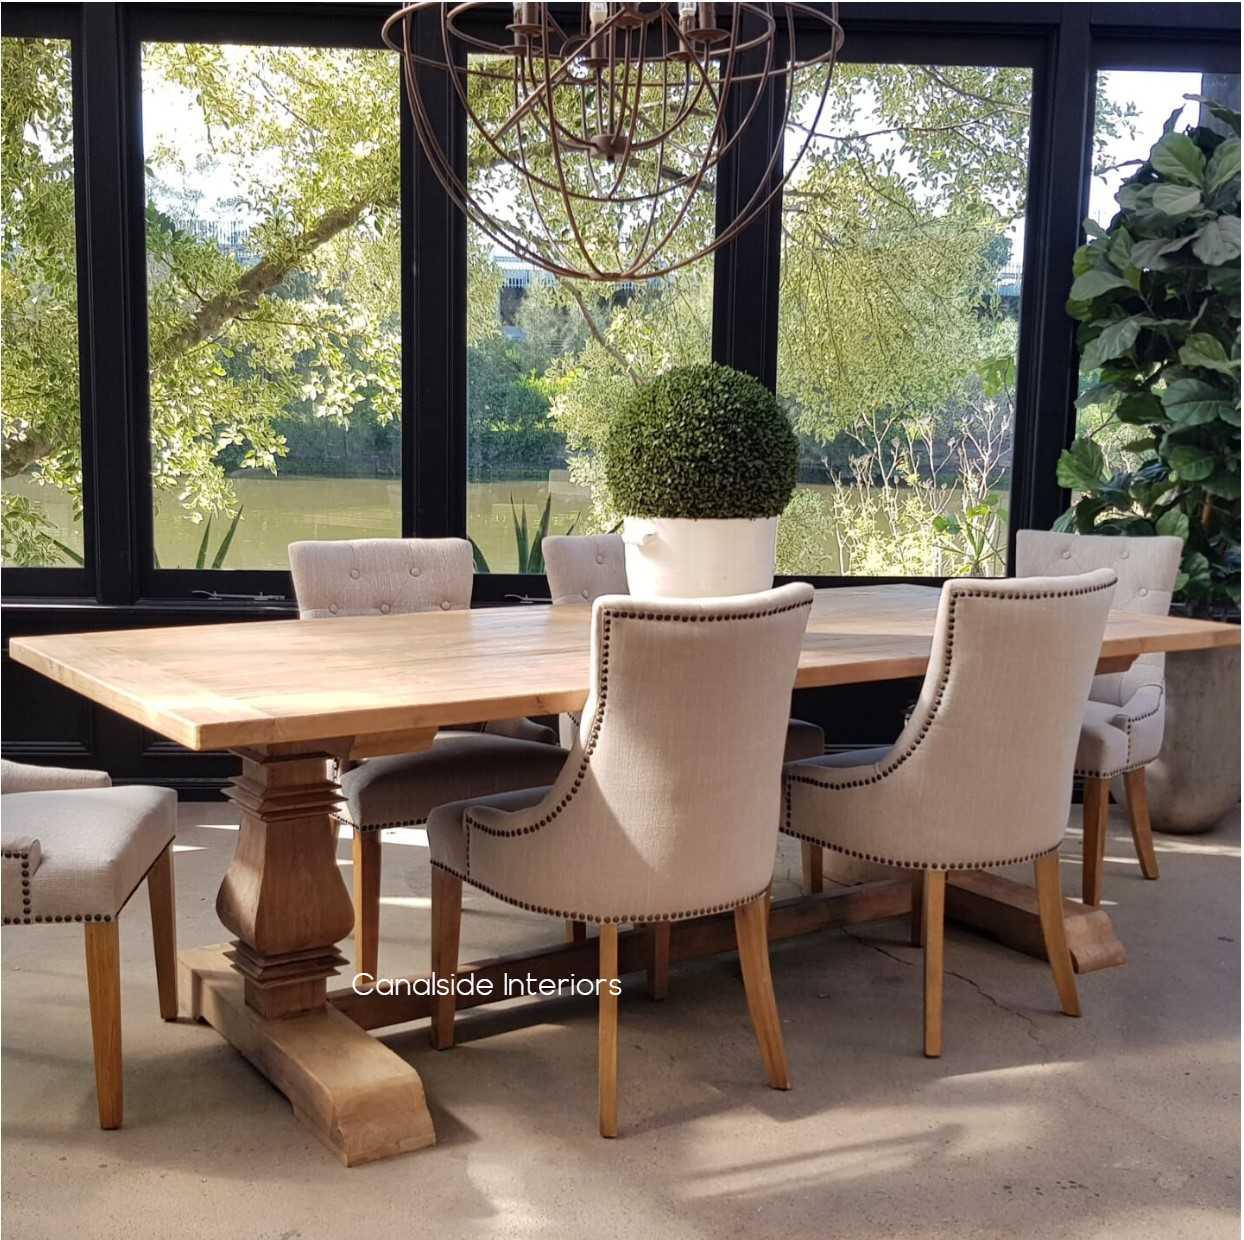 Artisan Hamptons Dining Table Canalside Interiors